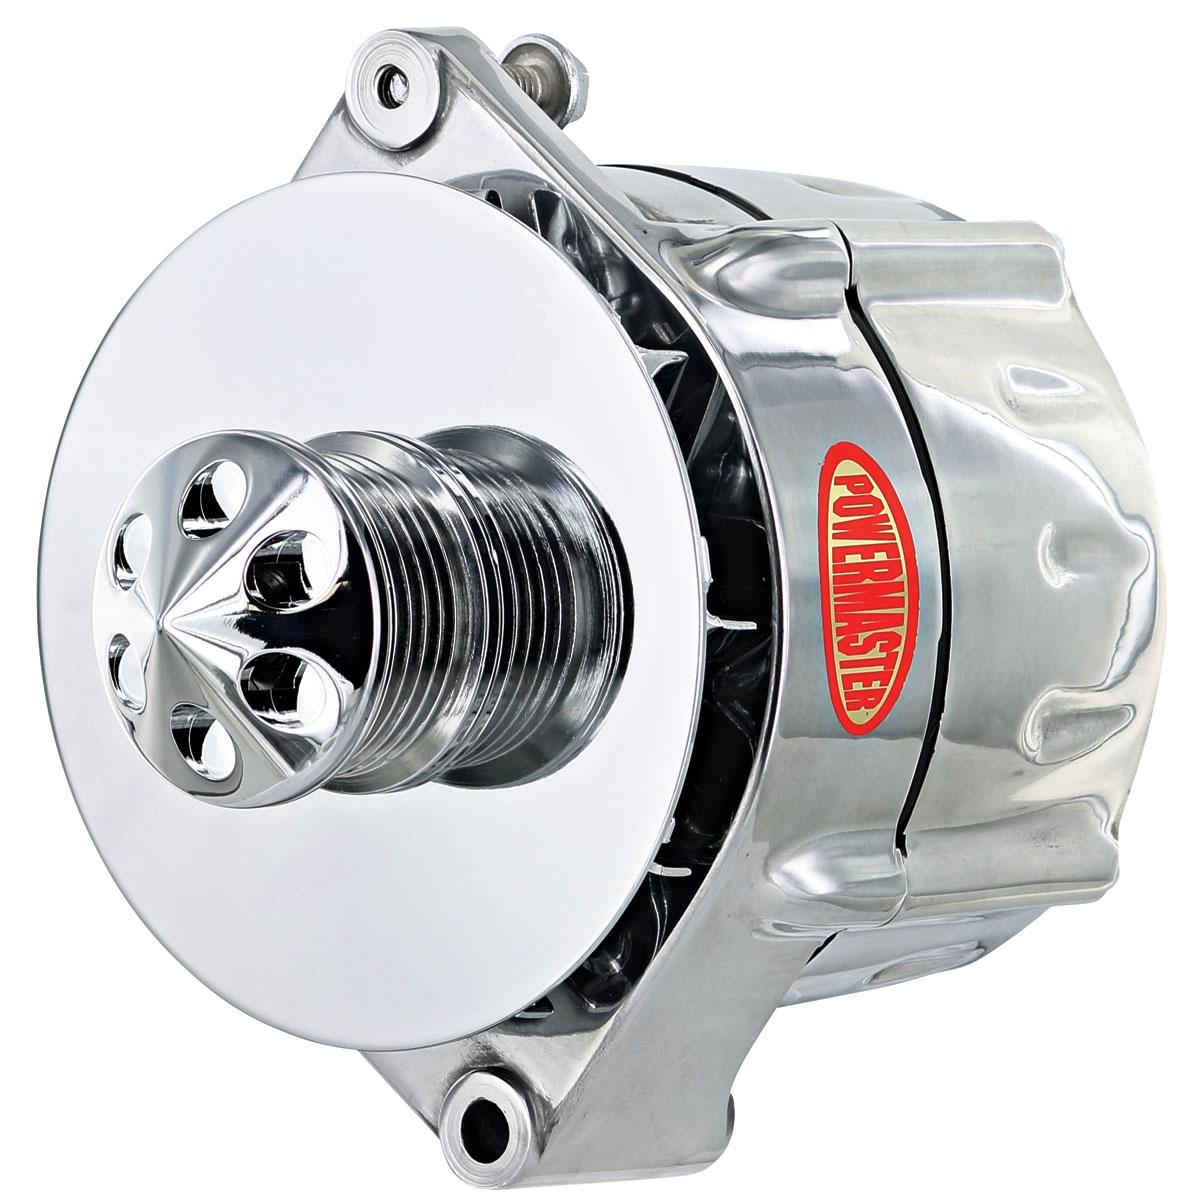 Alternator, Powermaster, 59-88 GM Cars, 12SI, Smooth, Polished, 150AMP, 6-Rib